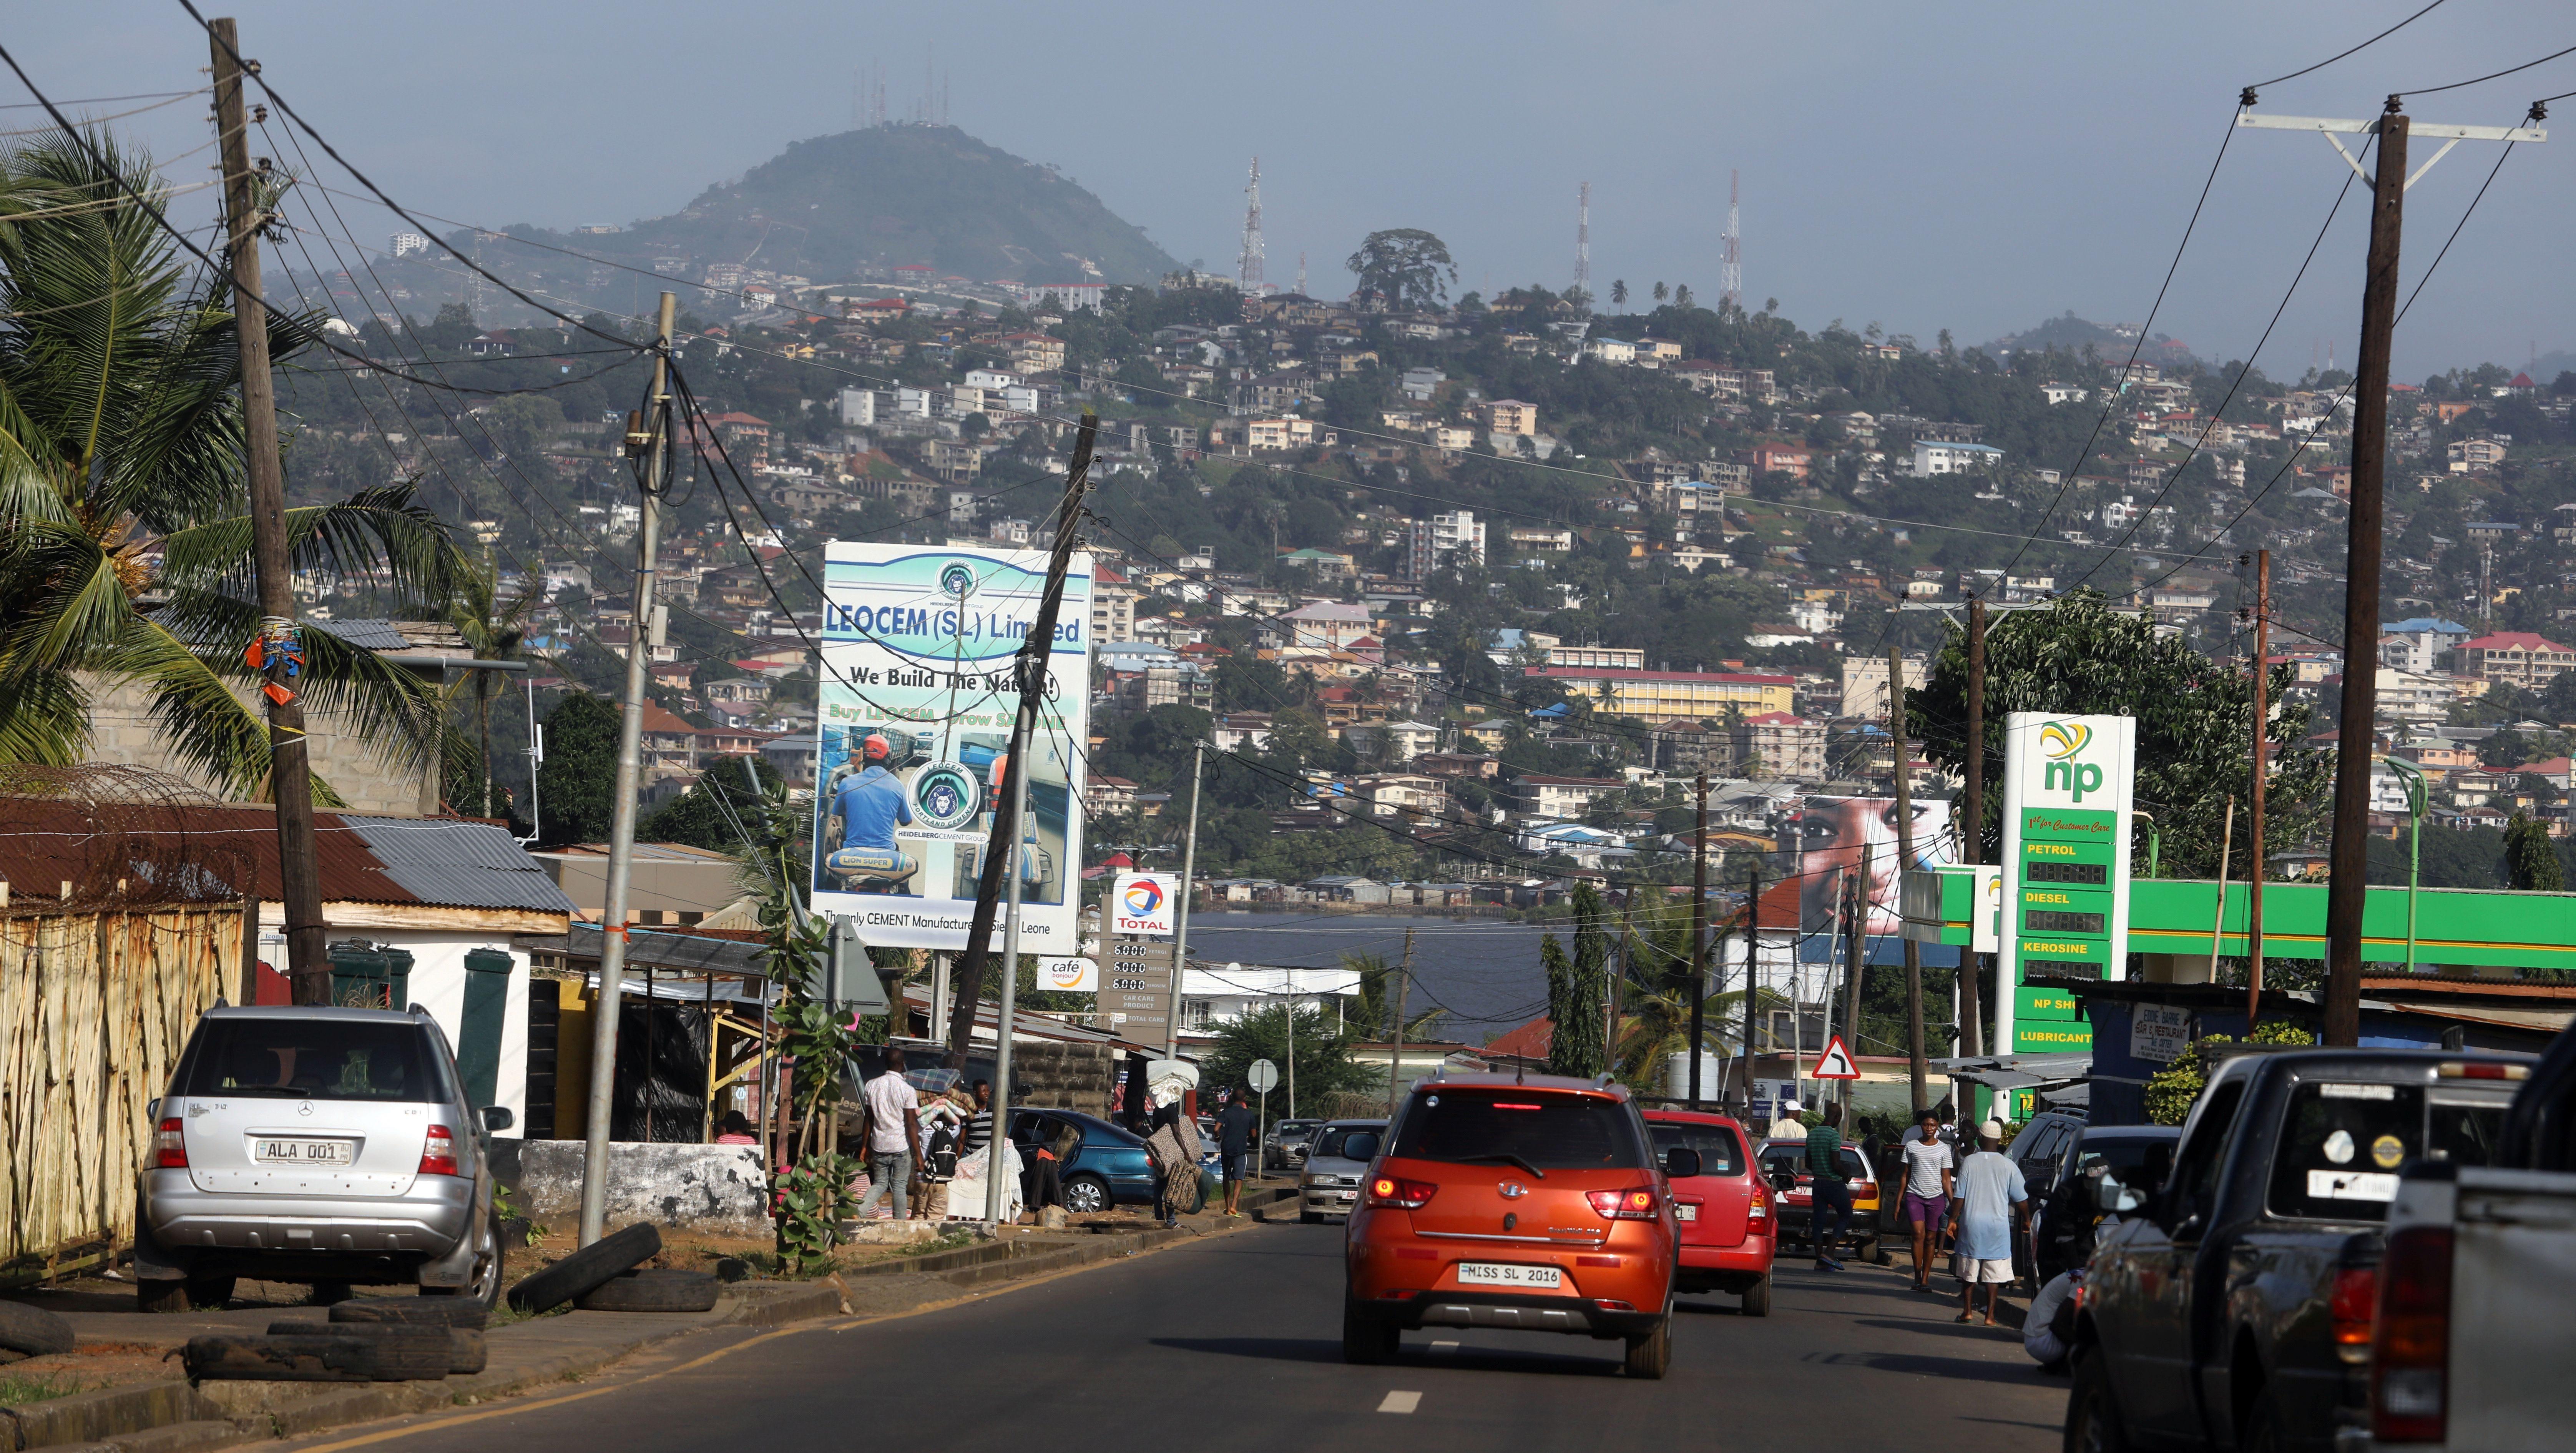 Cars are seen driving down a street in Aberdeen neighborhood of Freetown